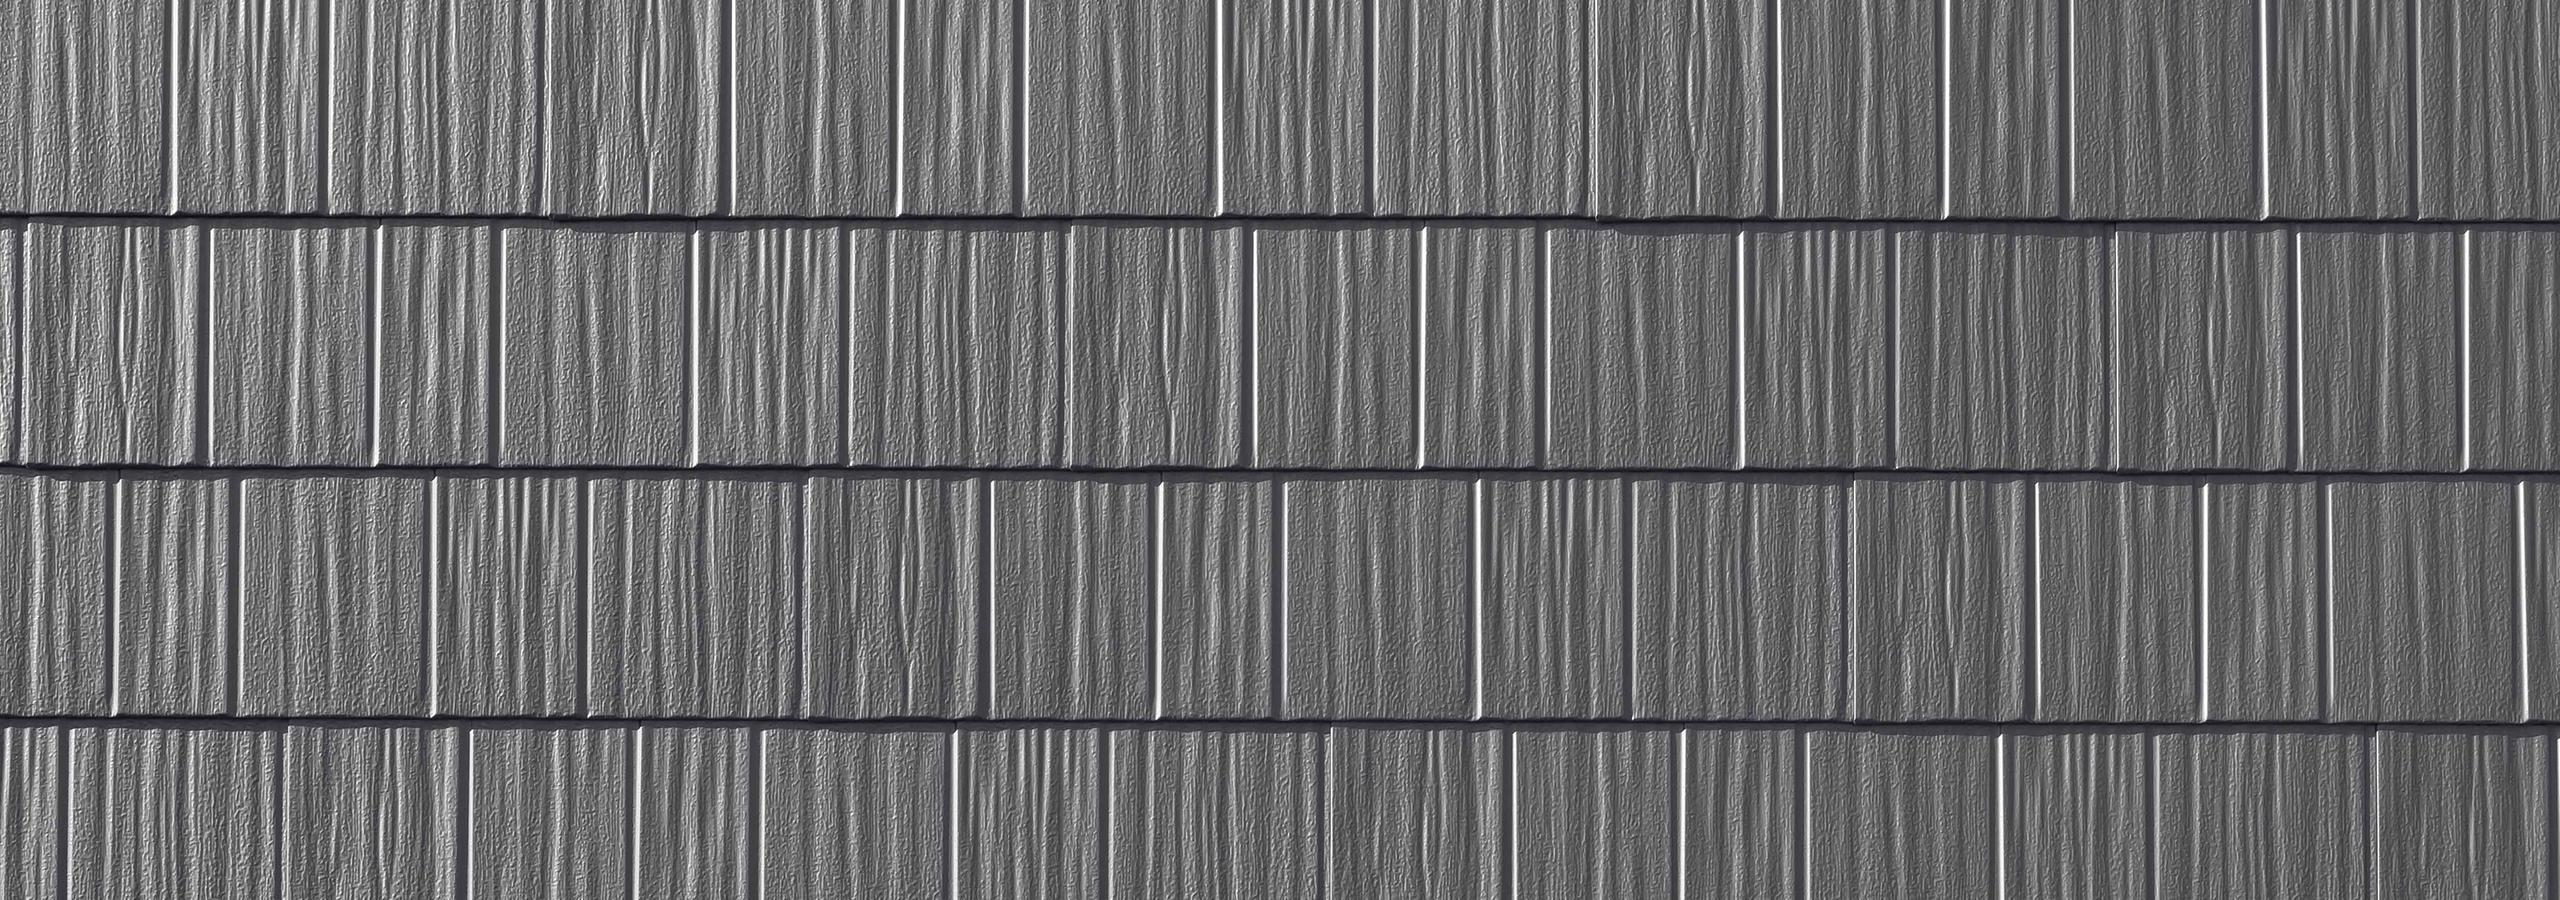 Gray steel roofing